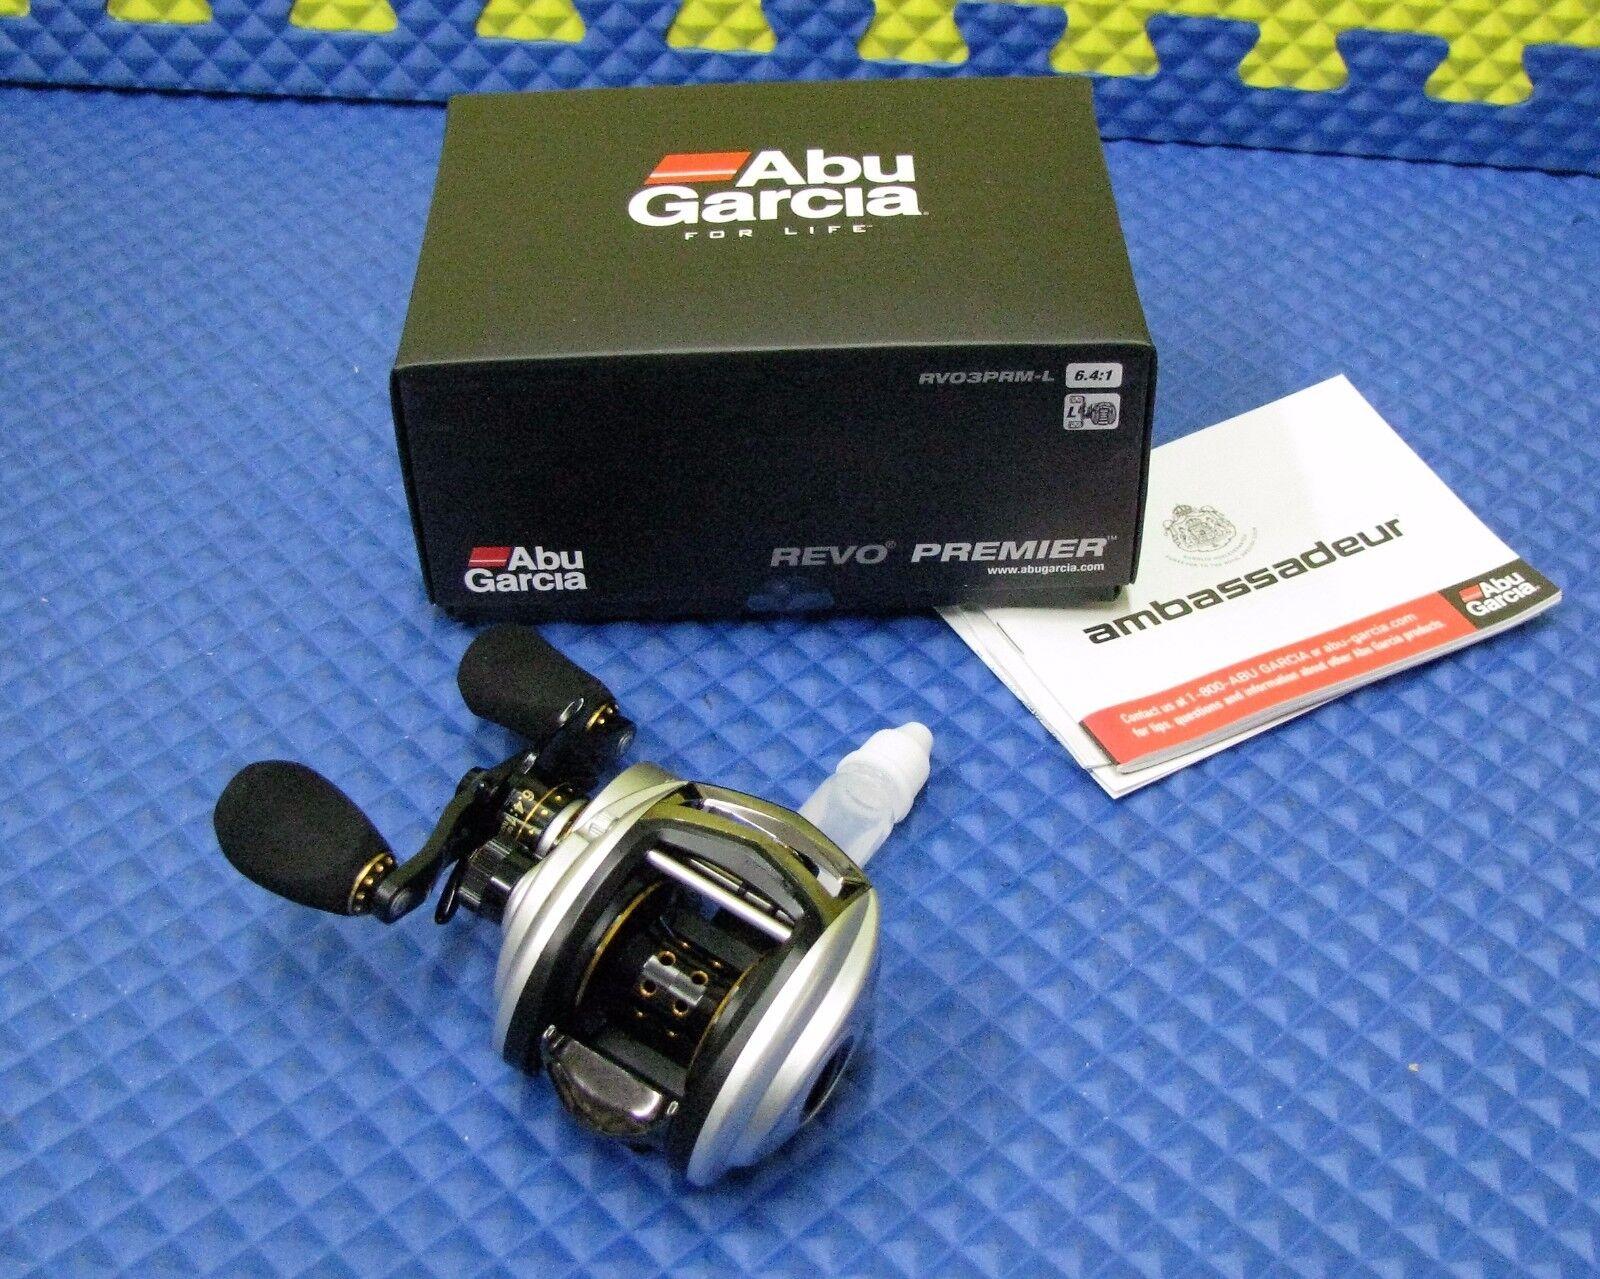 Abu Garcia REVO PREMIERE Left  Hand Lo Profile Baitcasting Reel RVO3PRM-L 1264554  inexpensive